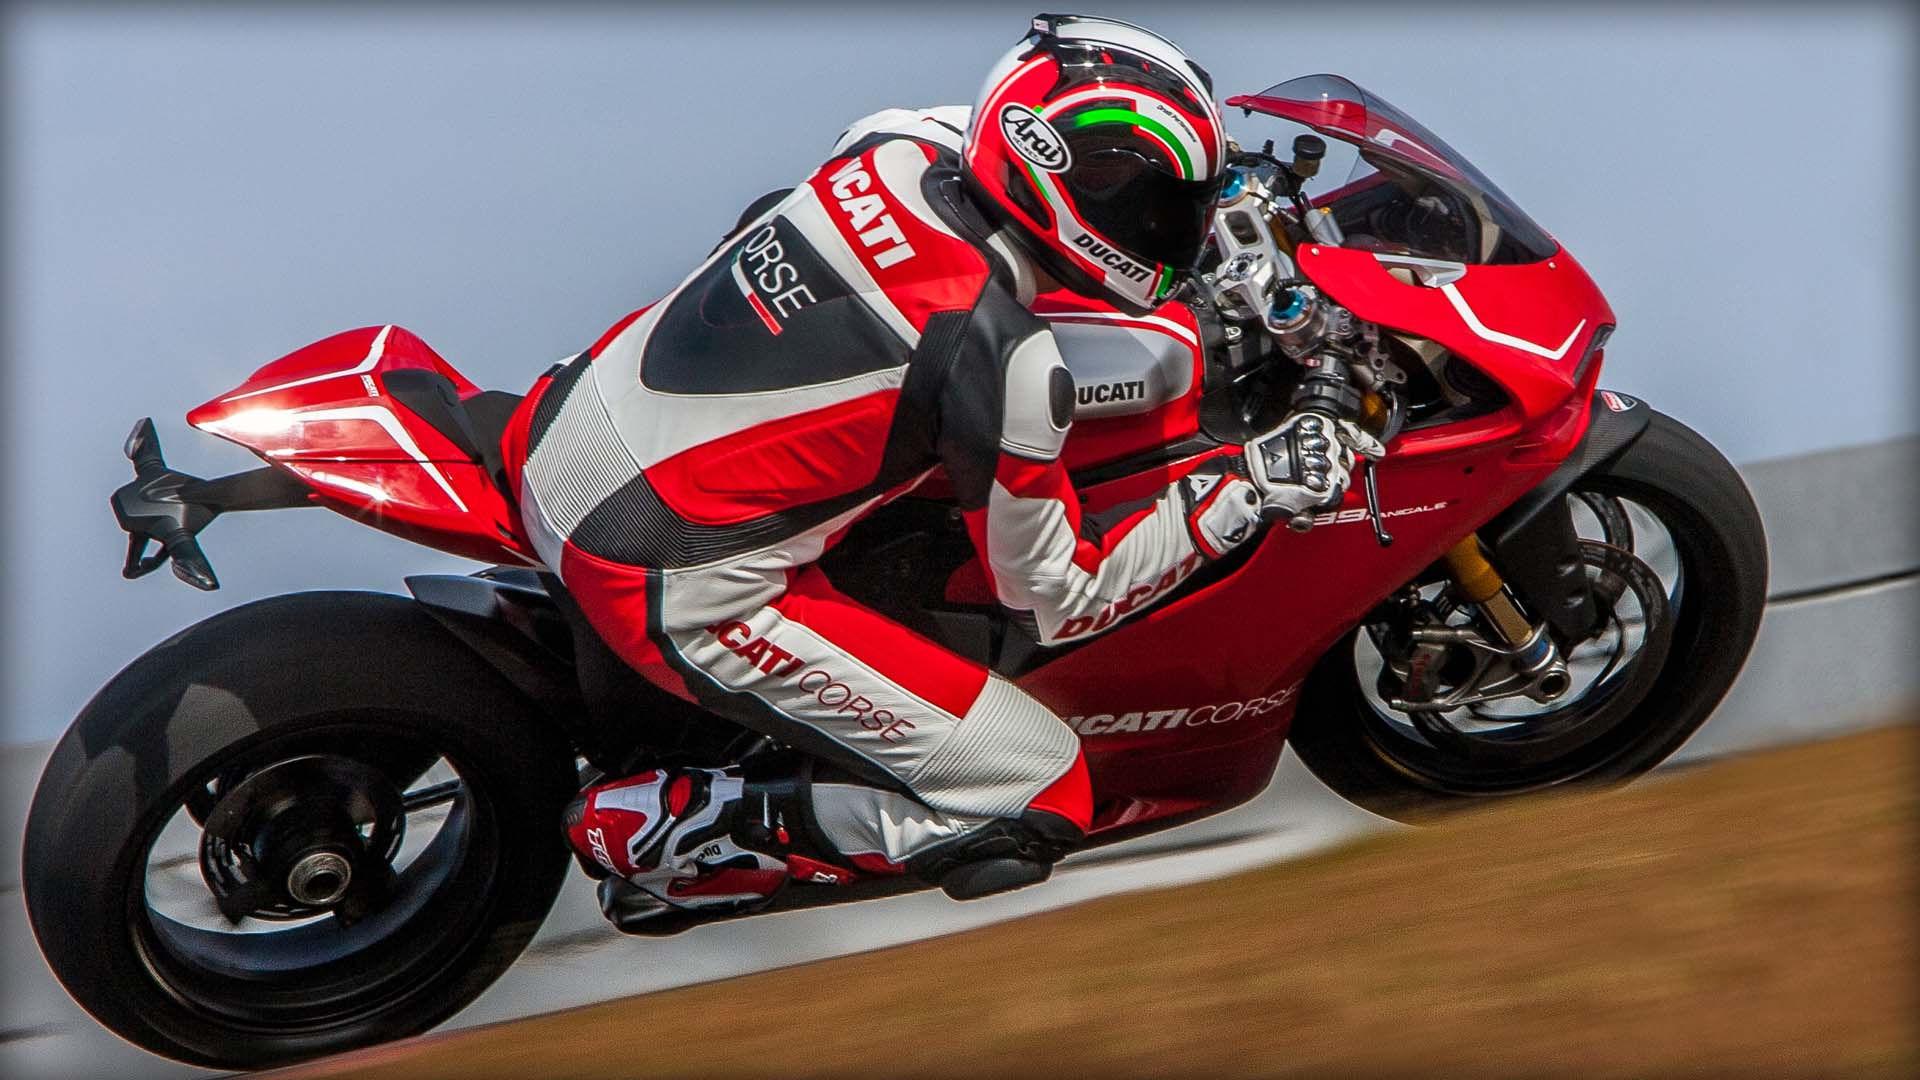 2014 Ducati  | Ducati 1199 Panigale R - Italian Racing